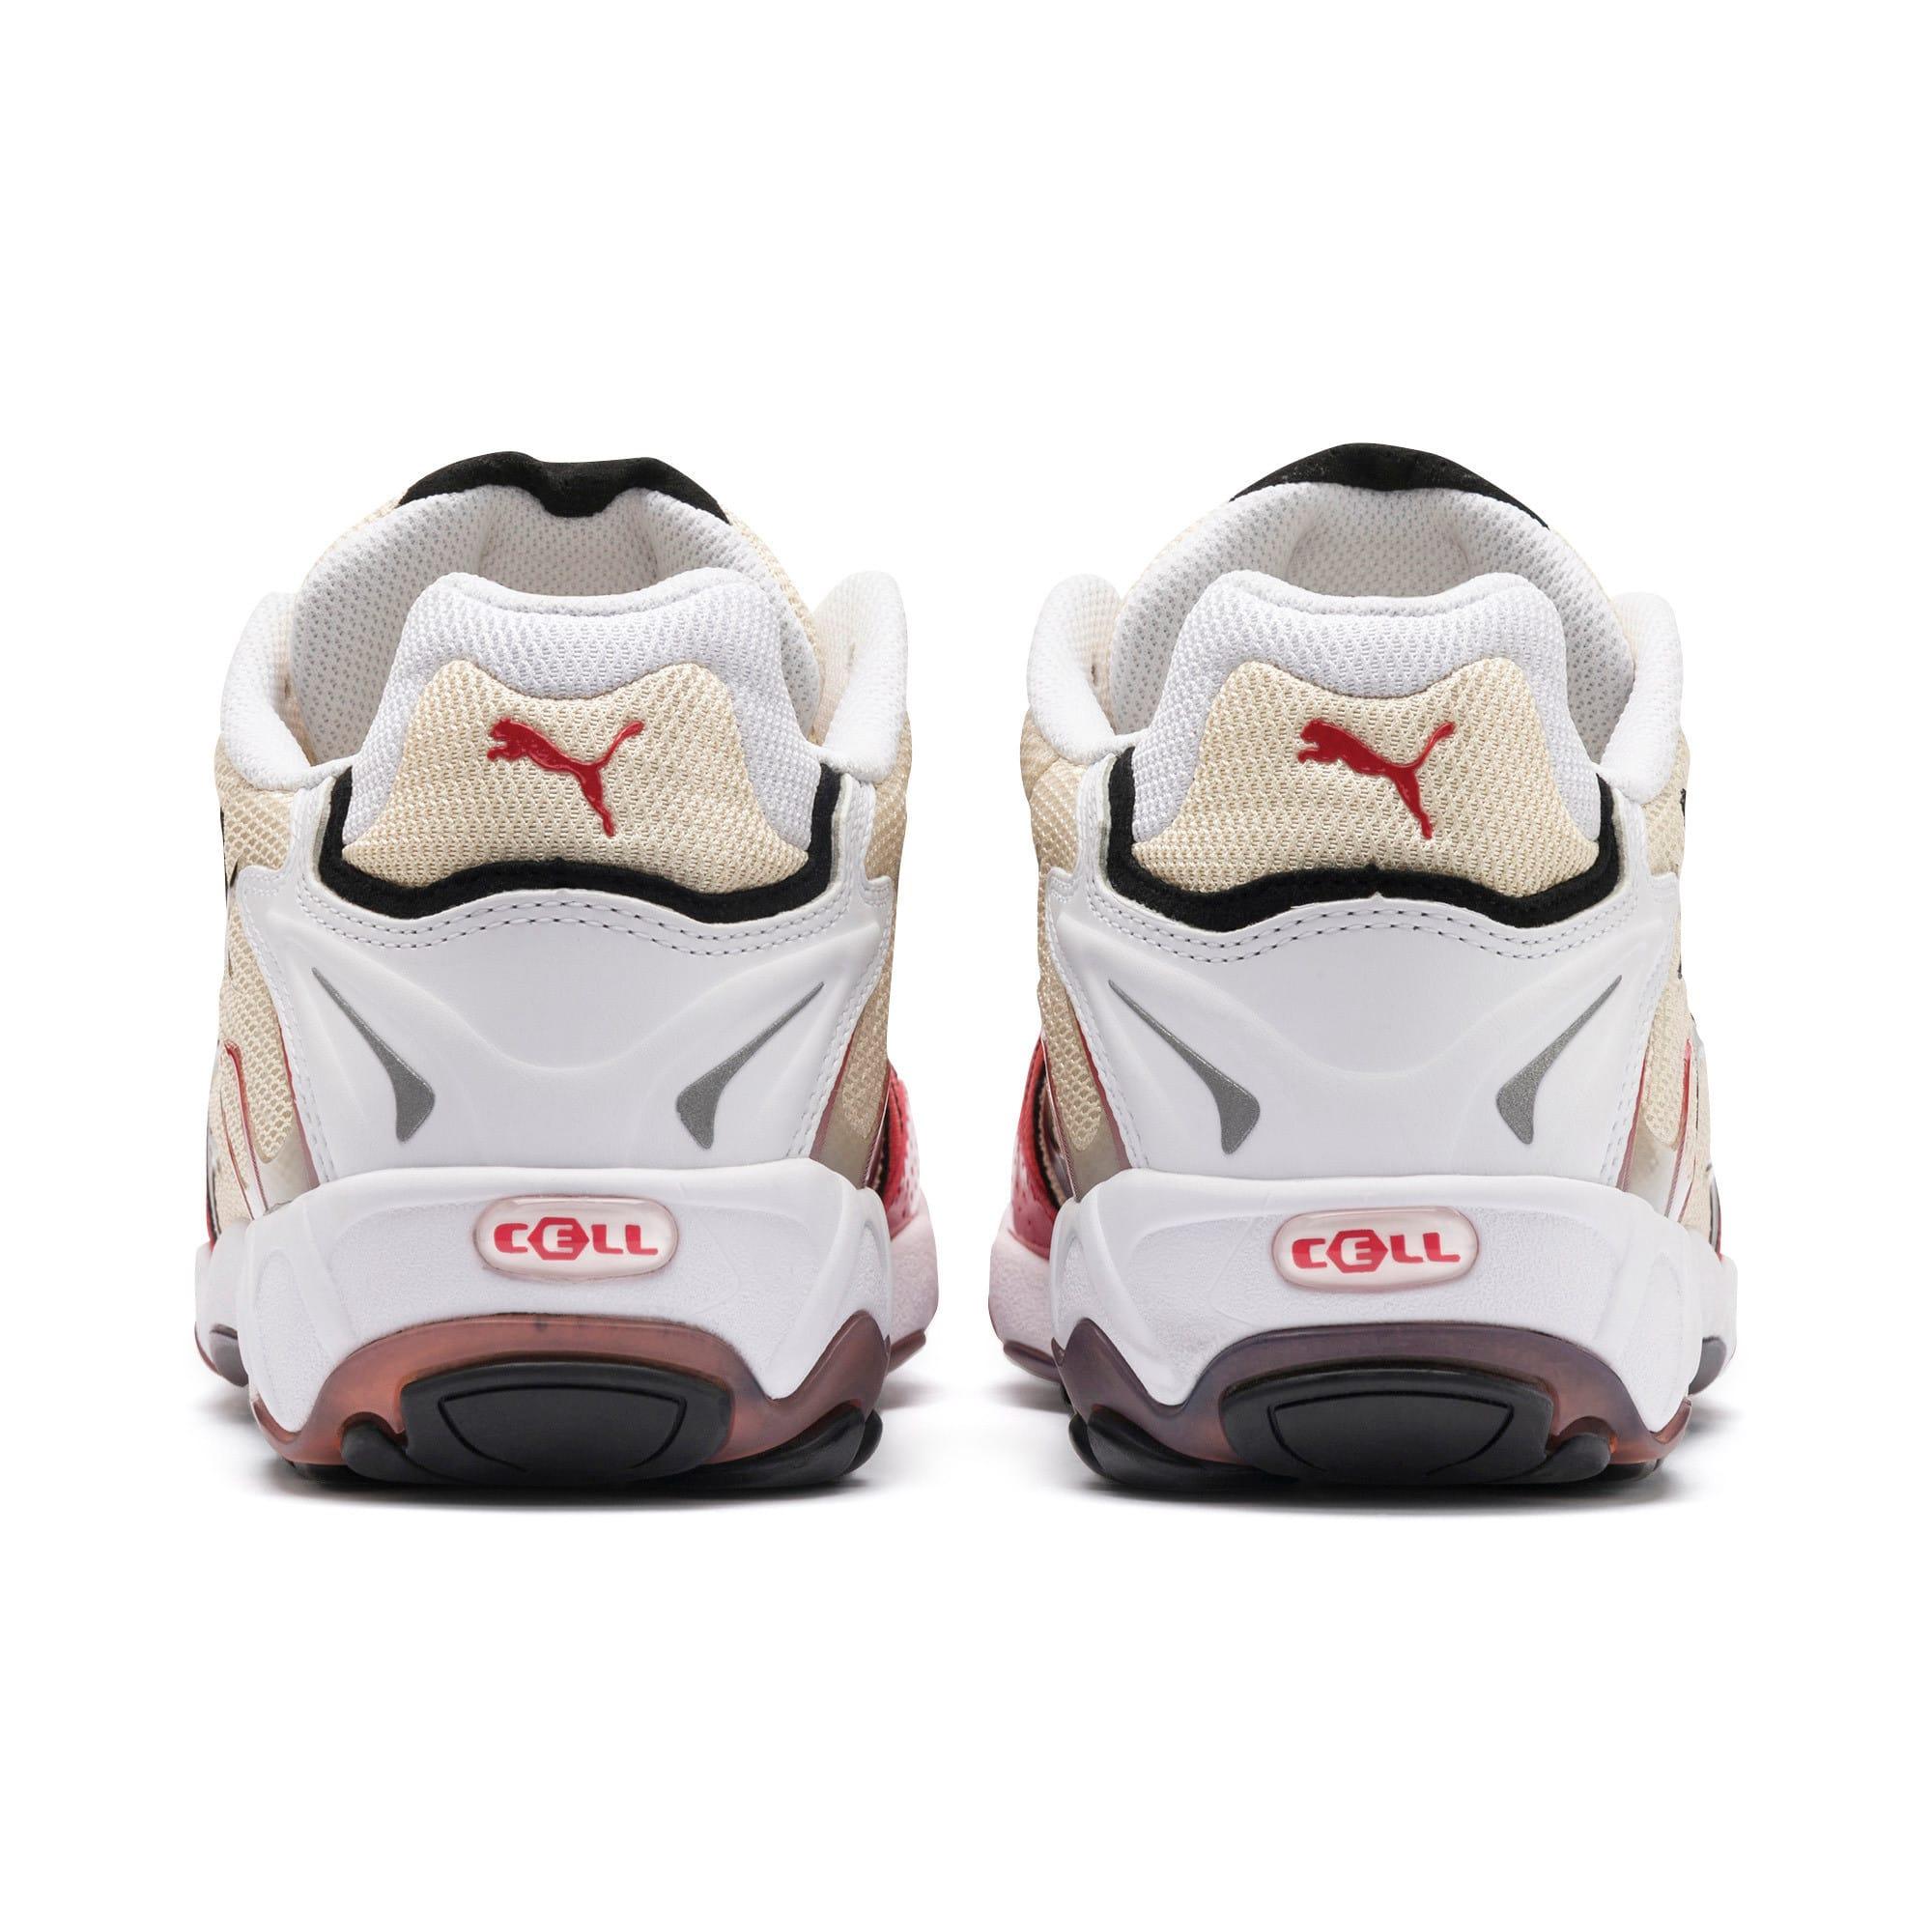 Thumbnail 4 of Inhale Sneakers, Summer Melon-High Risk Red, medium